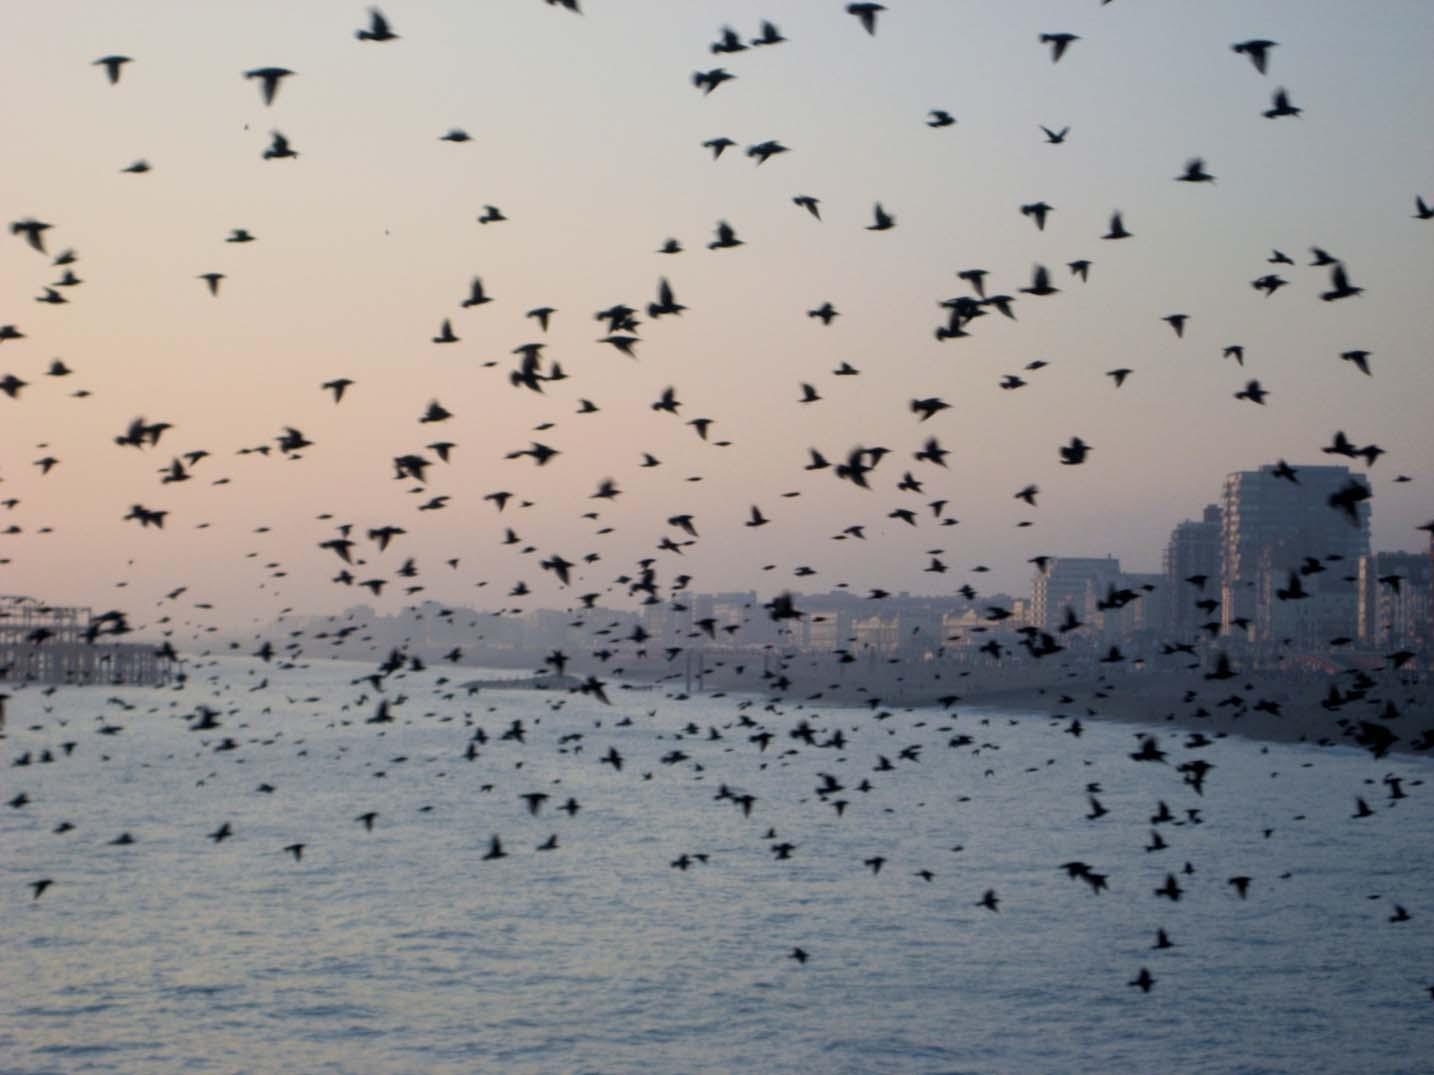 Brighton Pier starlings